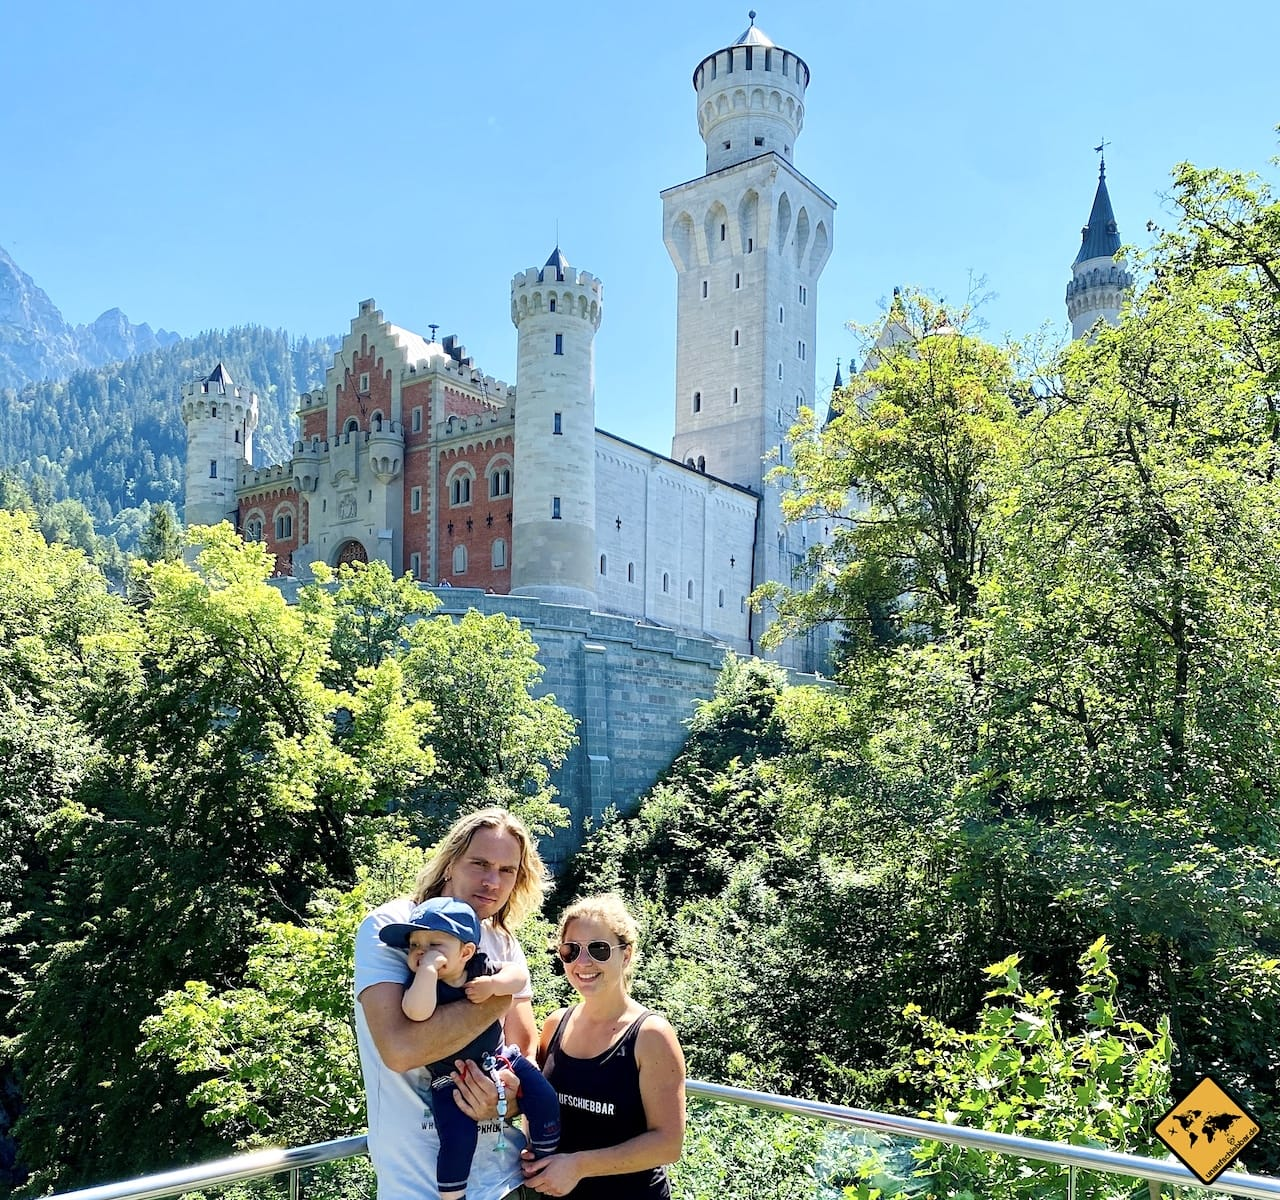 Skywalk Schloss Neuschwanstein